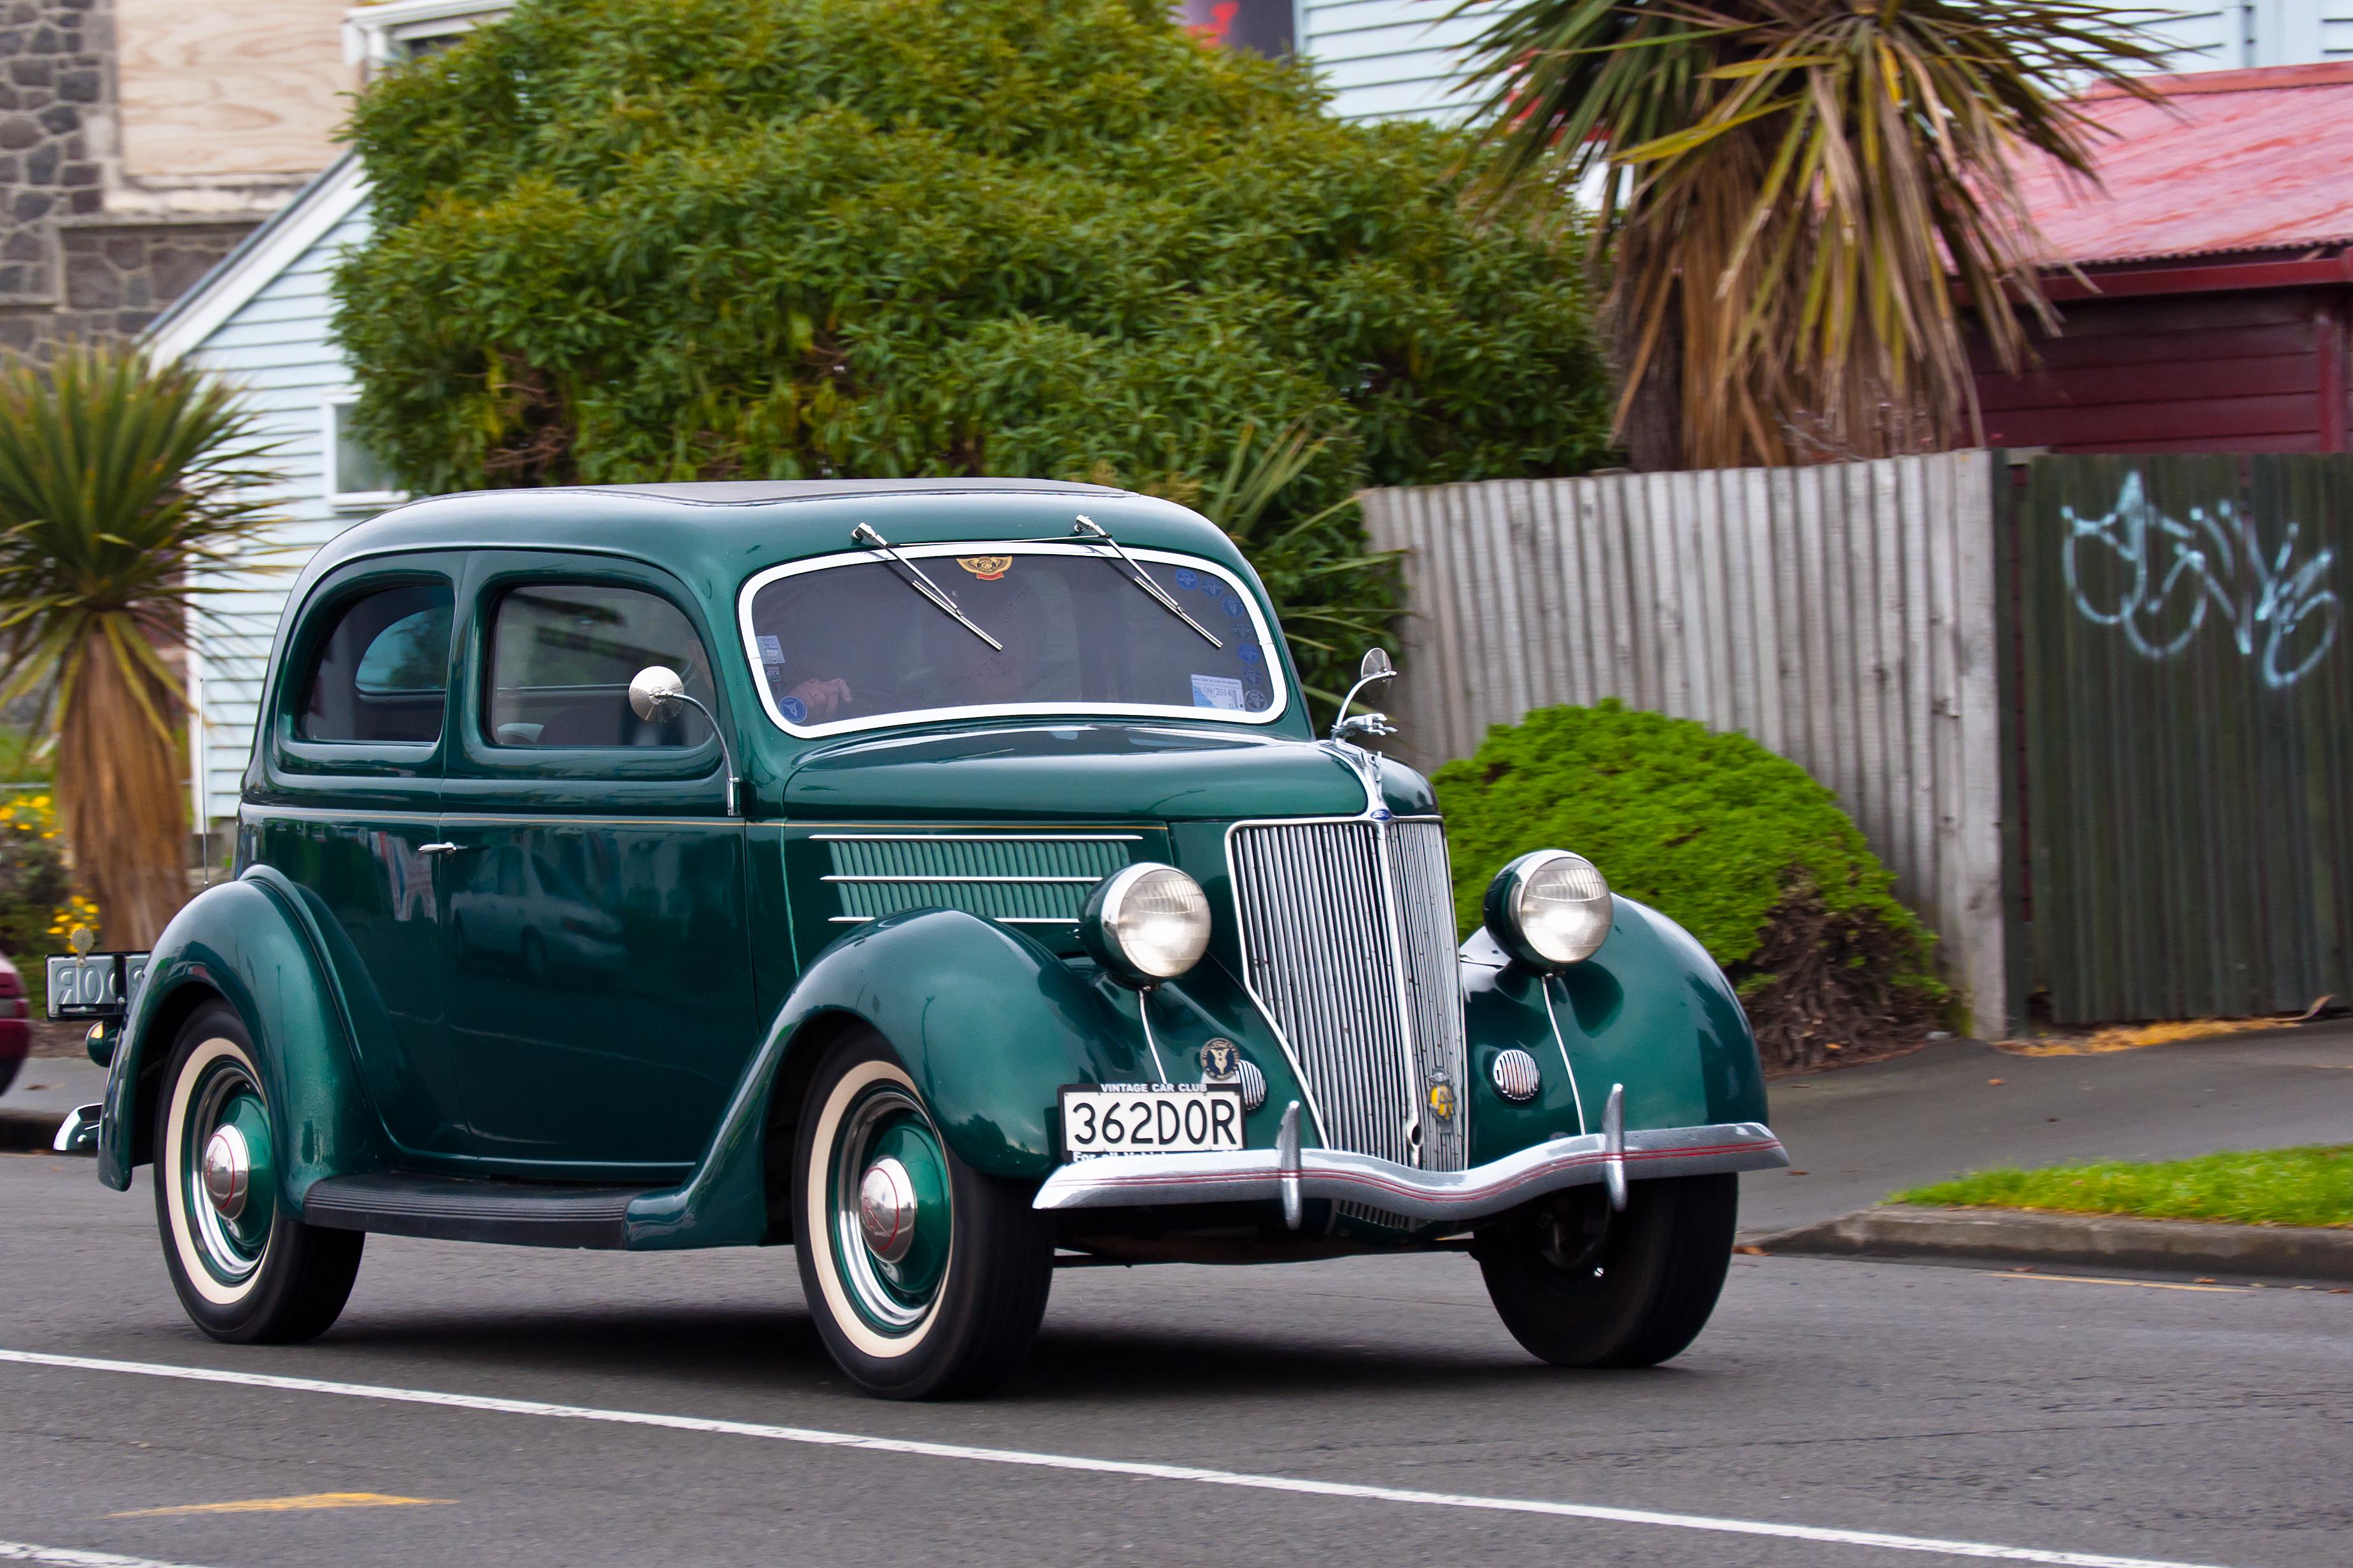 1935 FORD TUDOR, 1935, Car, Ford, New Brighton, HQ Photo